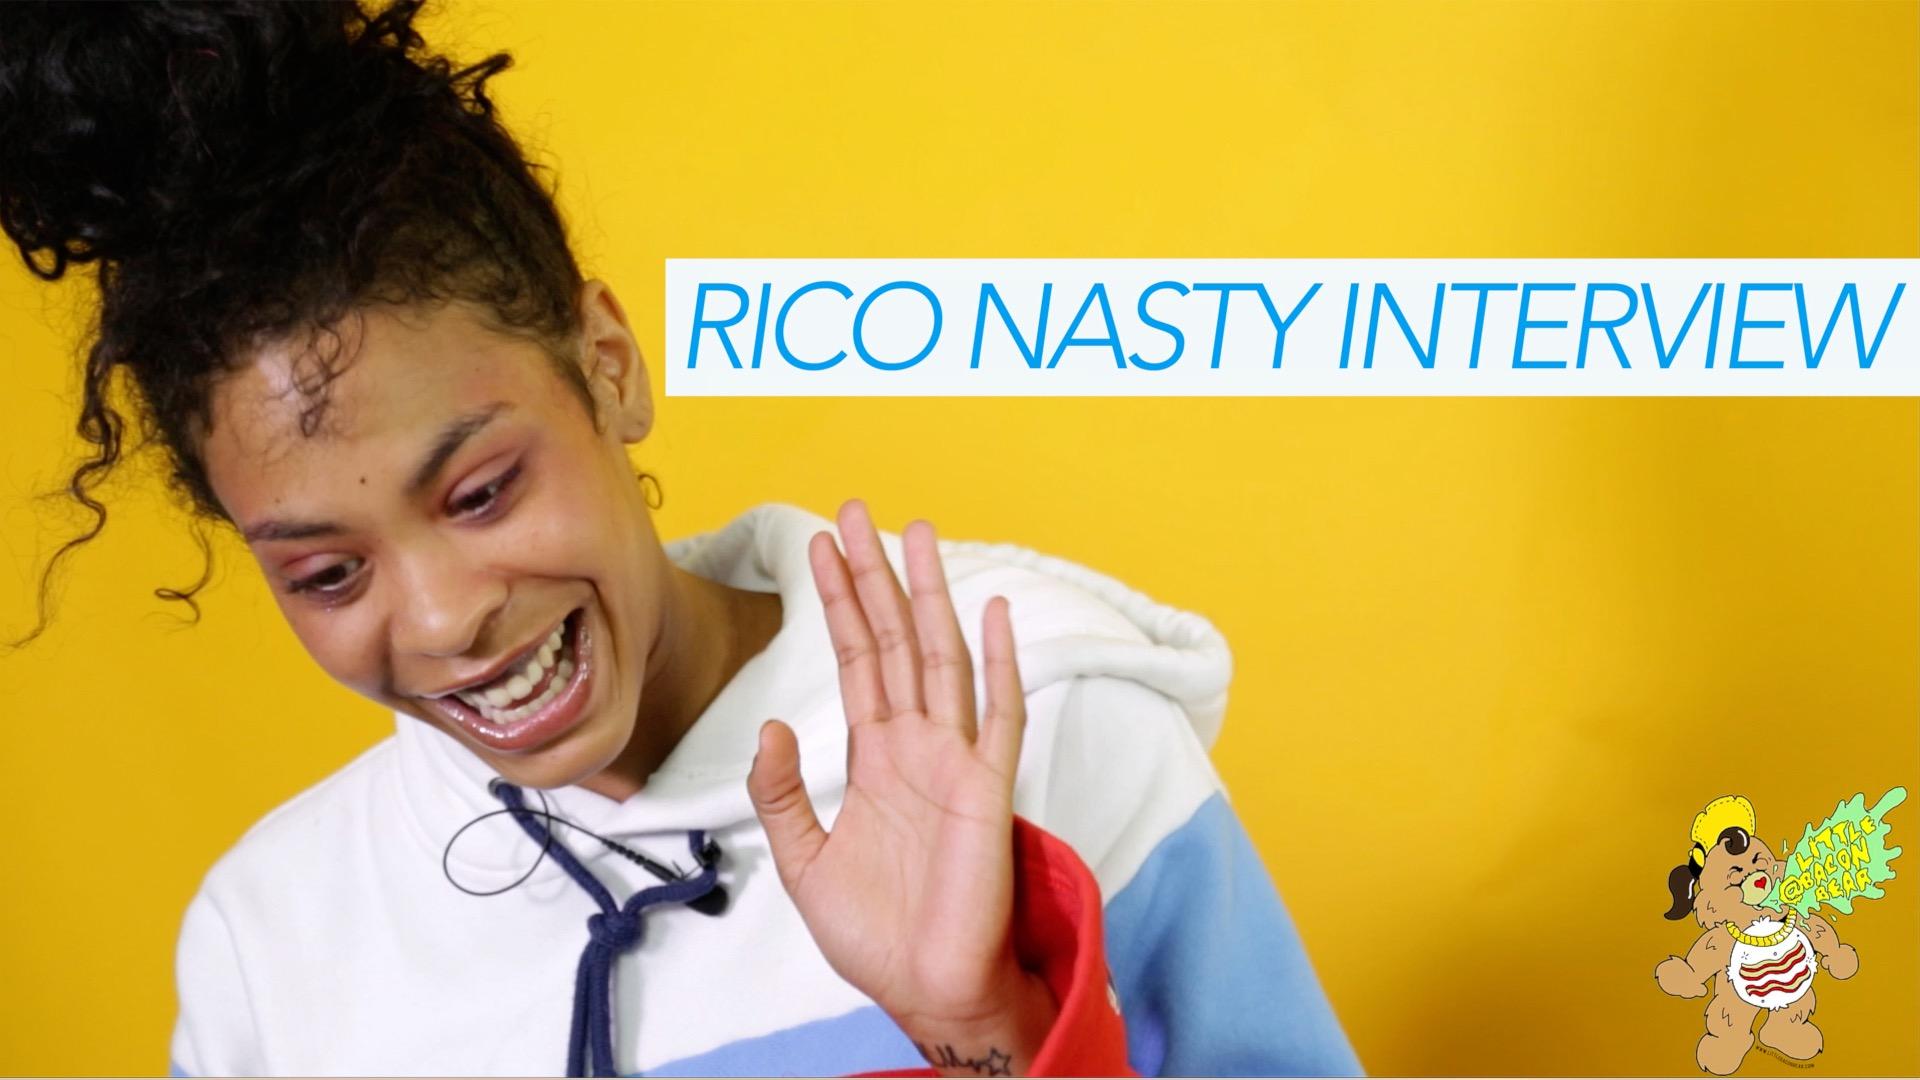 Rico Nasty